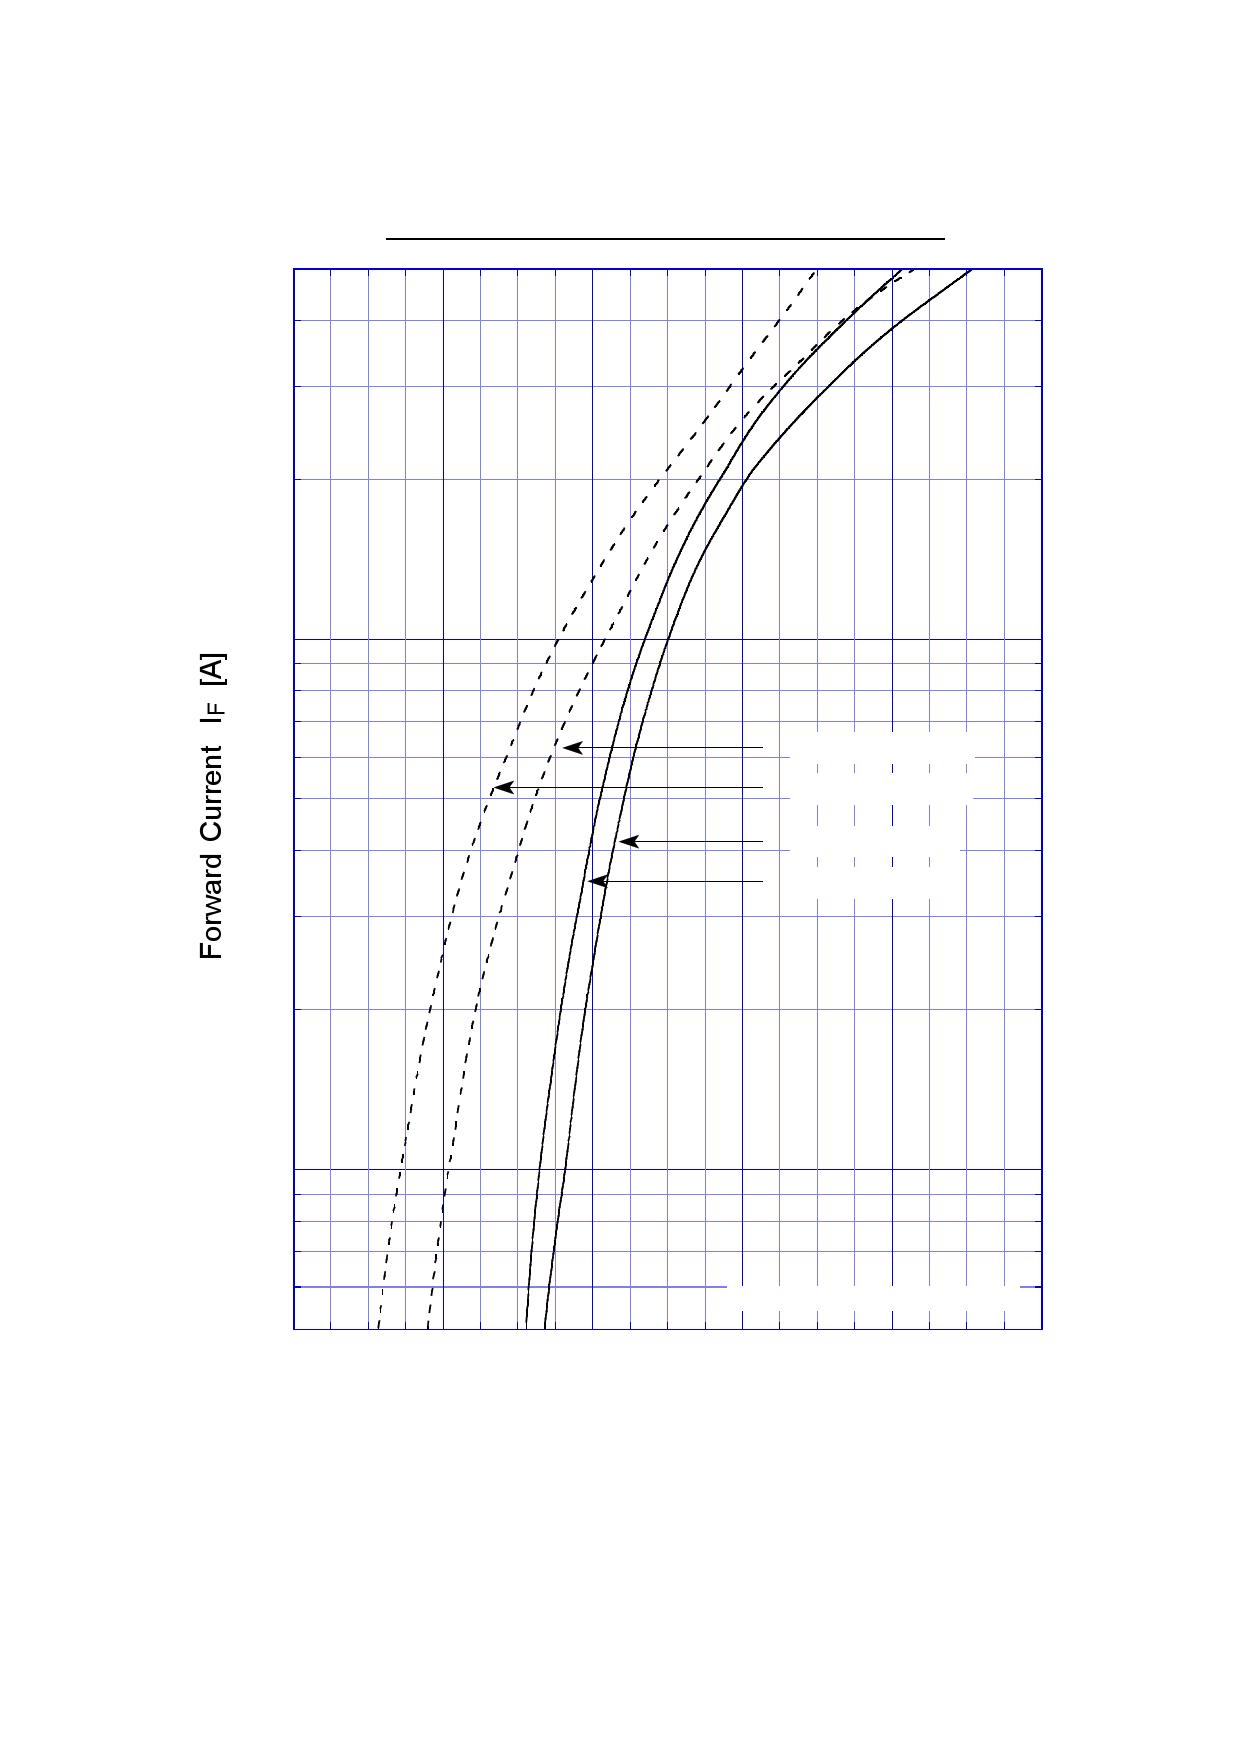 S30SC4M pdf schematic